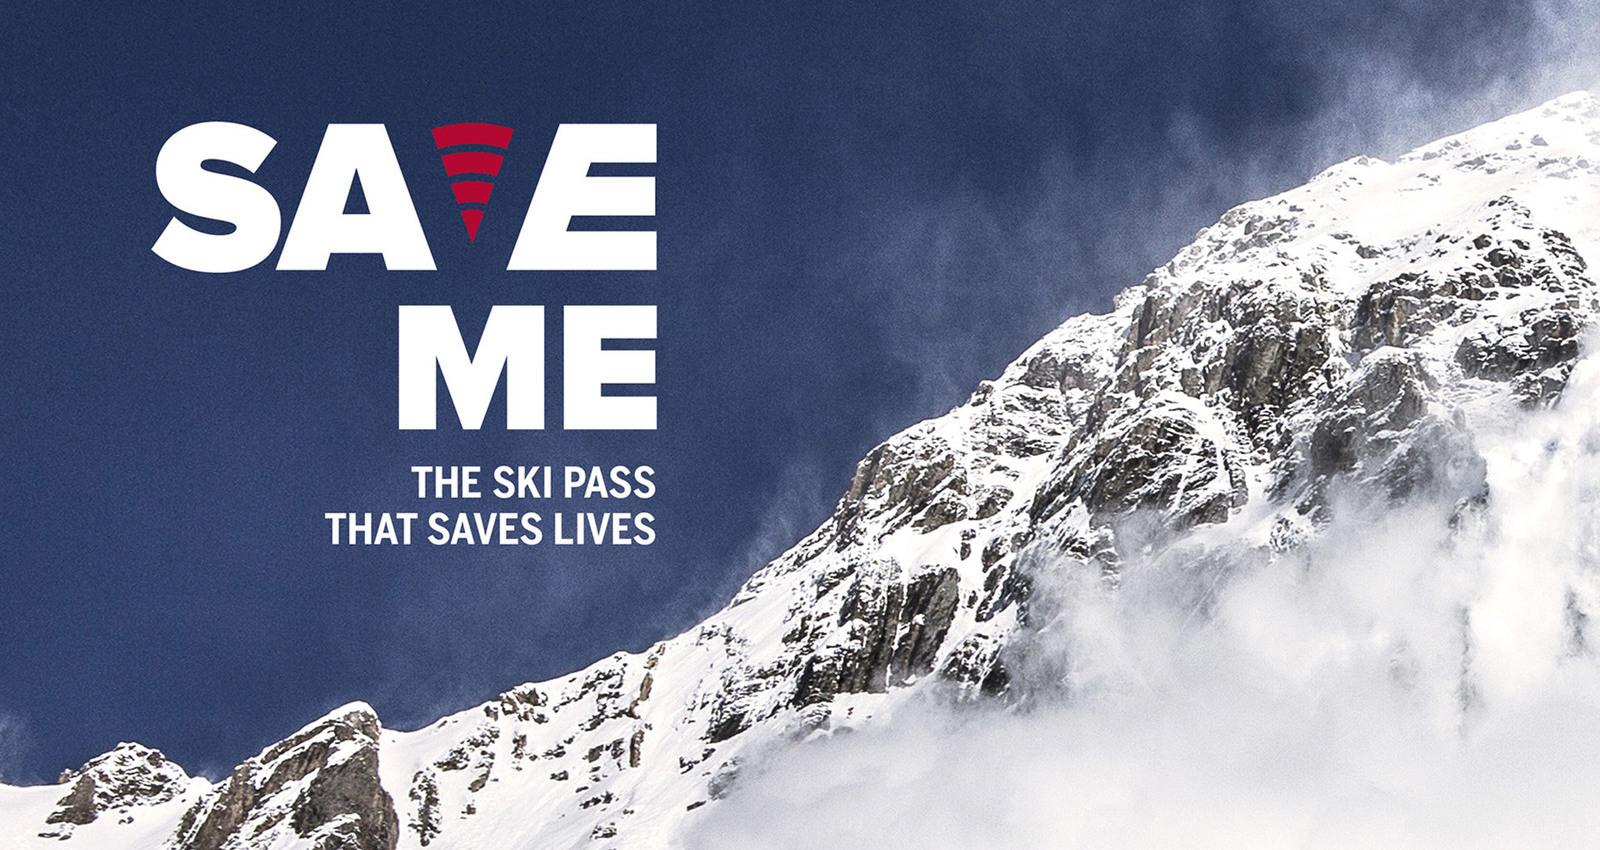 Save me – the ski pass that saves lives